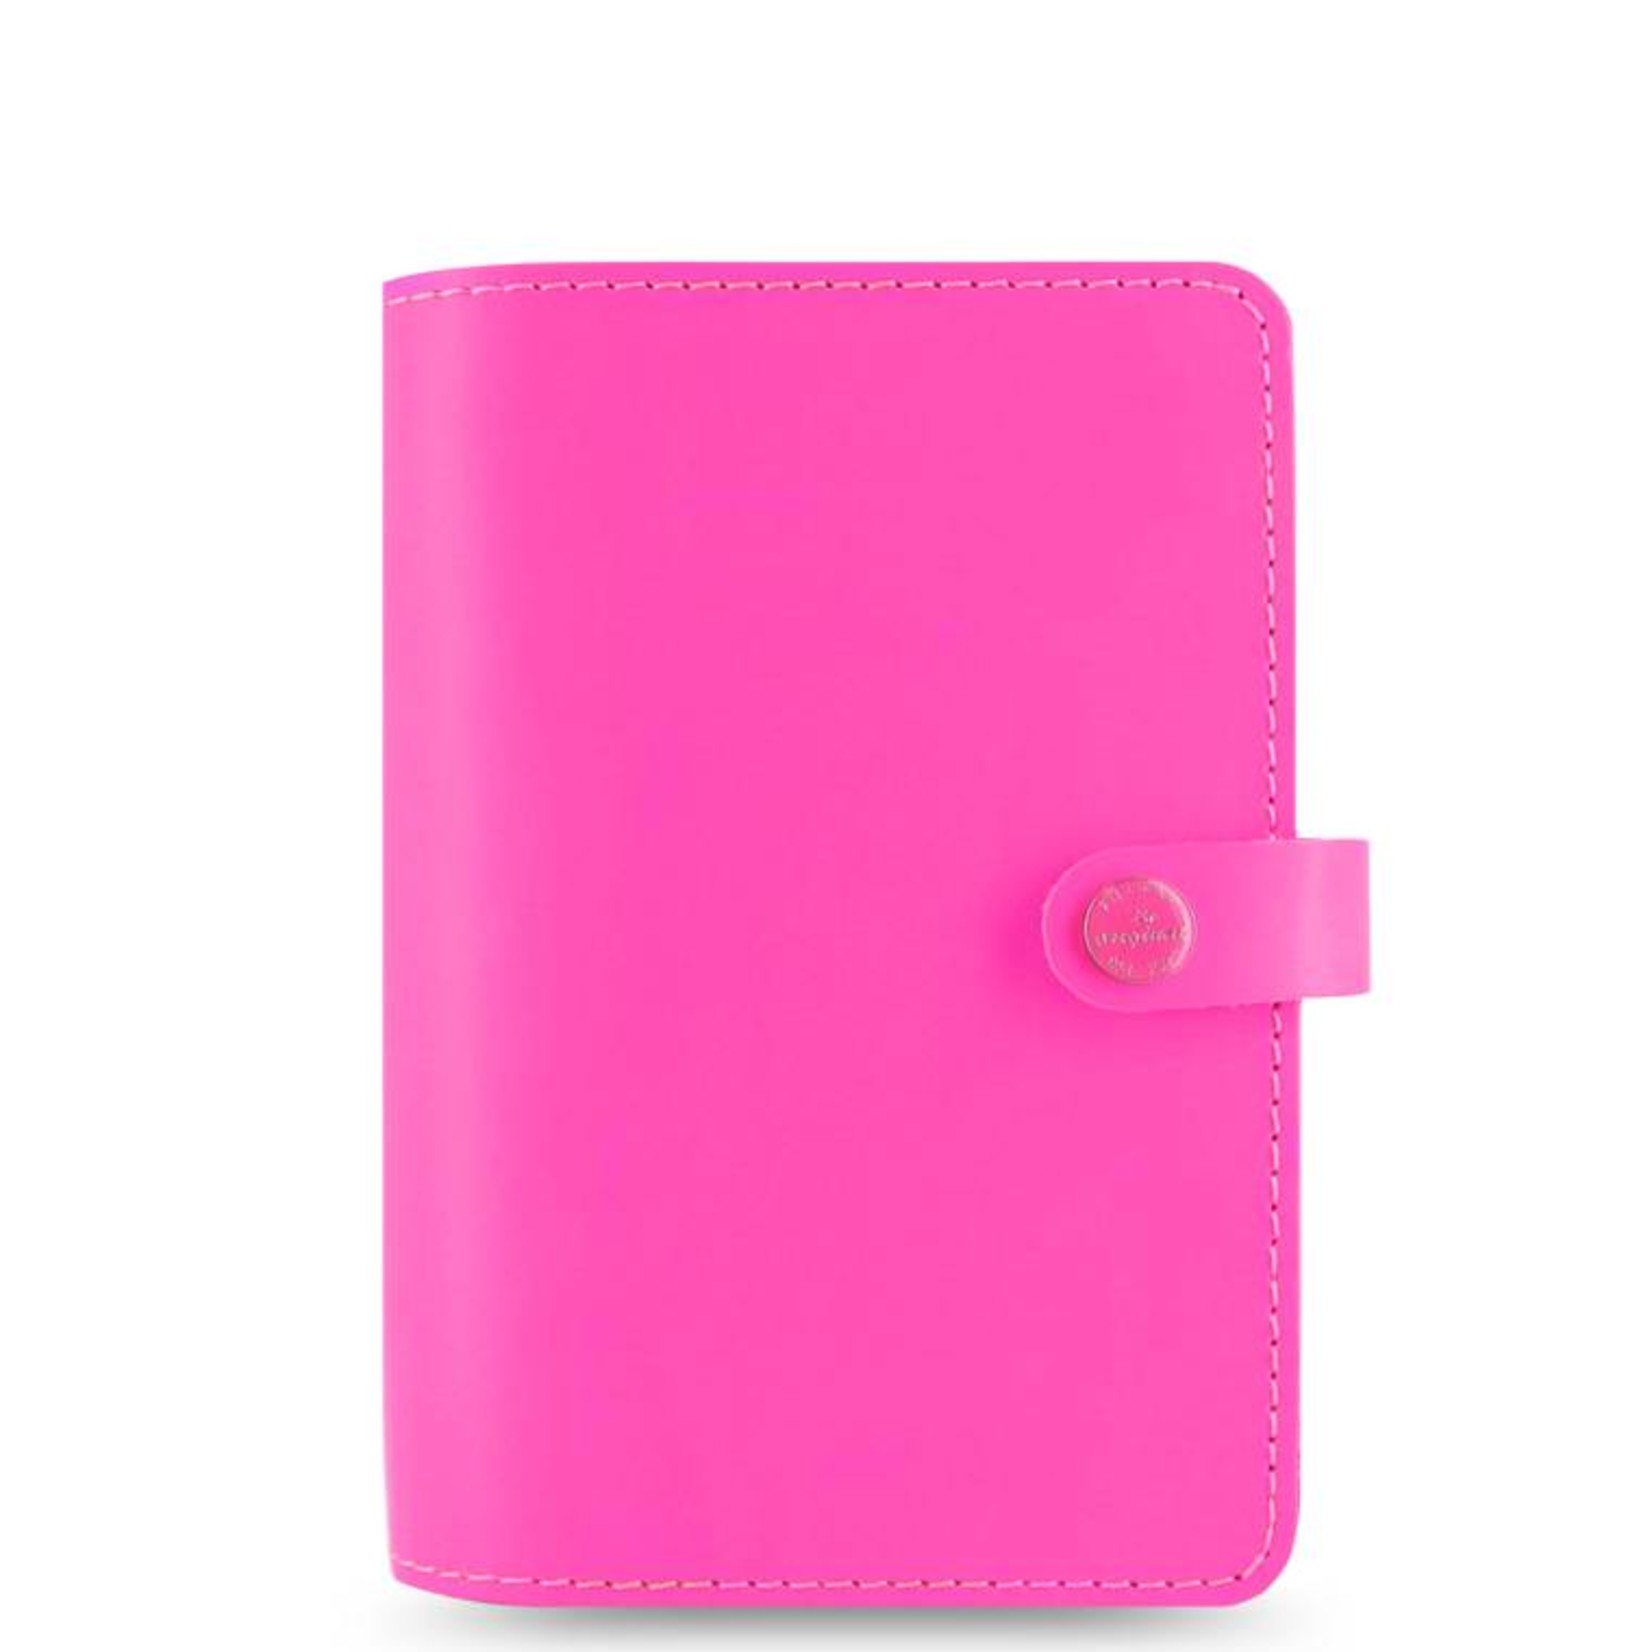 Filofax Organiser The Original Personal, Fluoro Pink